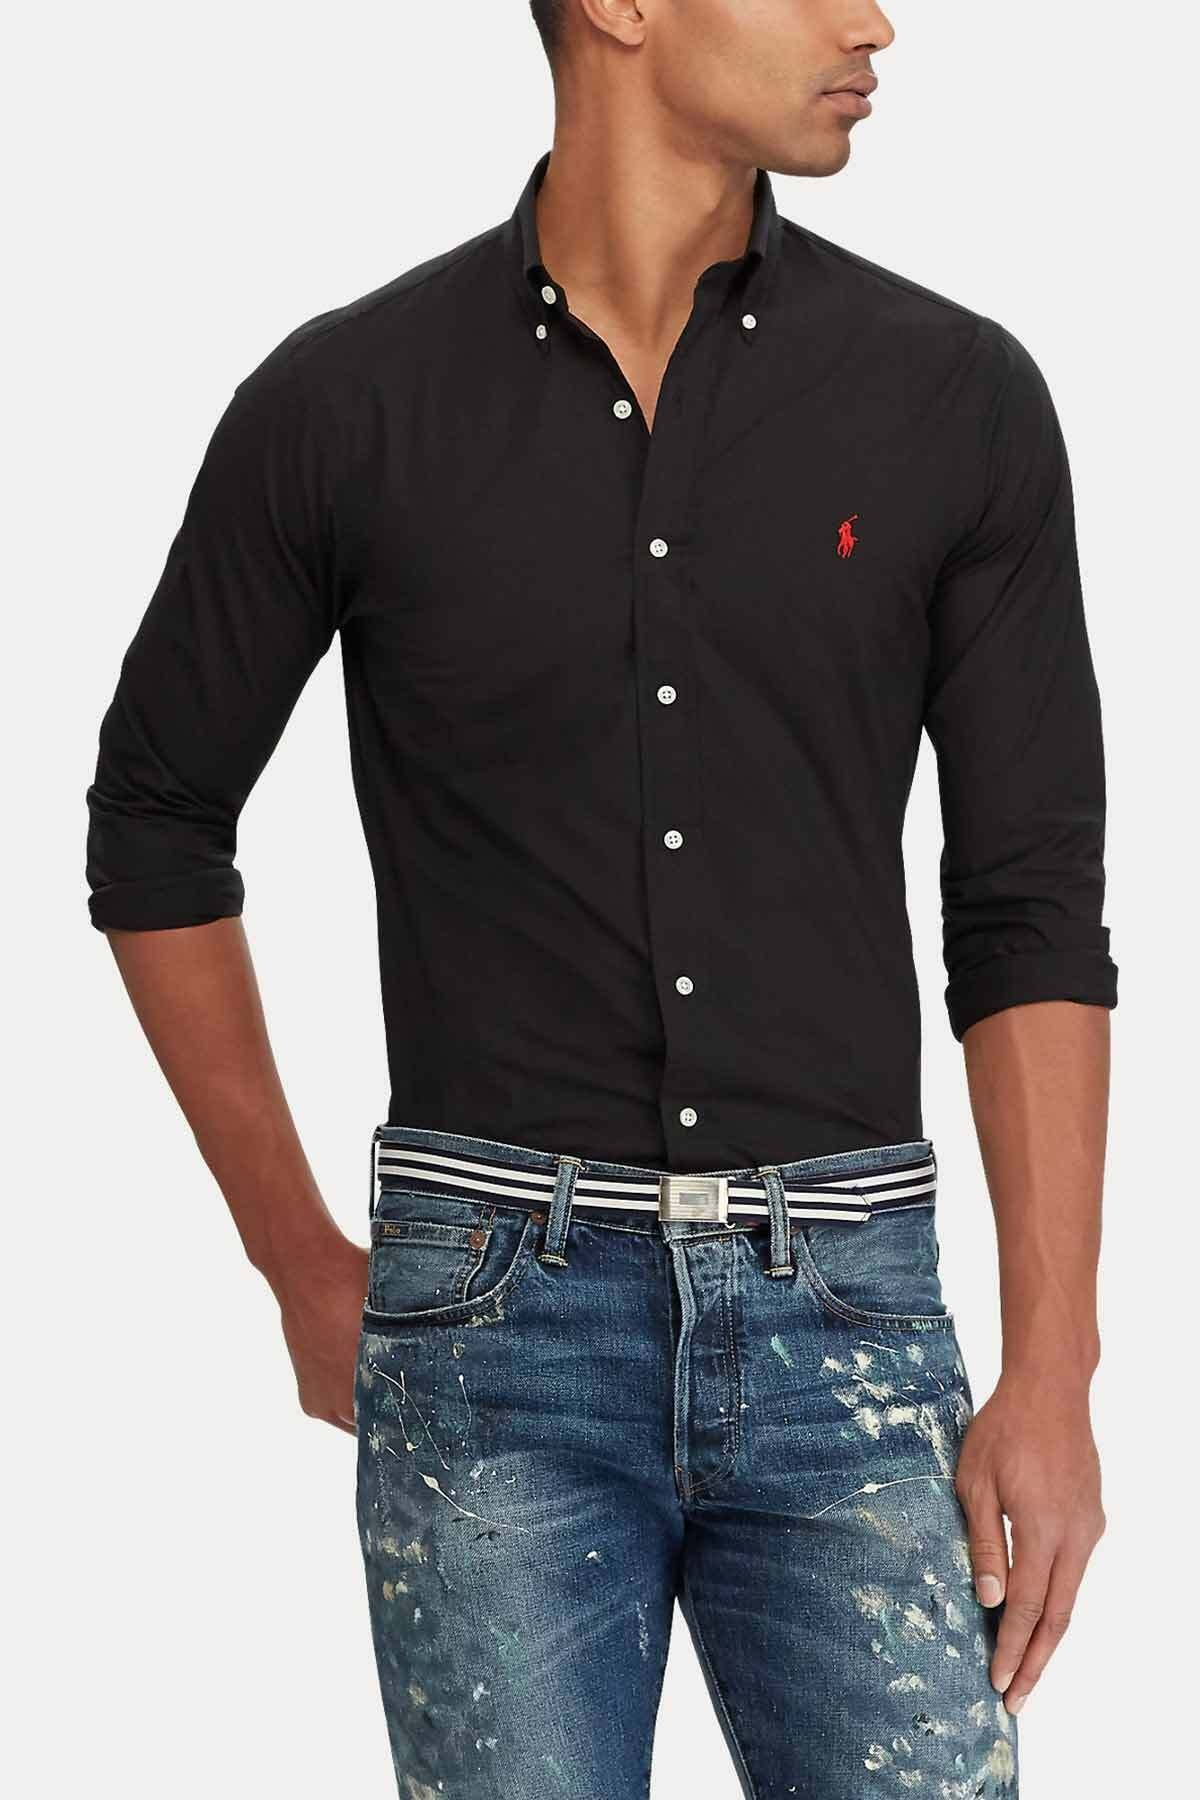 Polo Ralph Lauren Erkek Siyah Slim Fit Gömlek 2